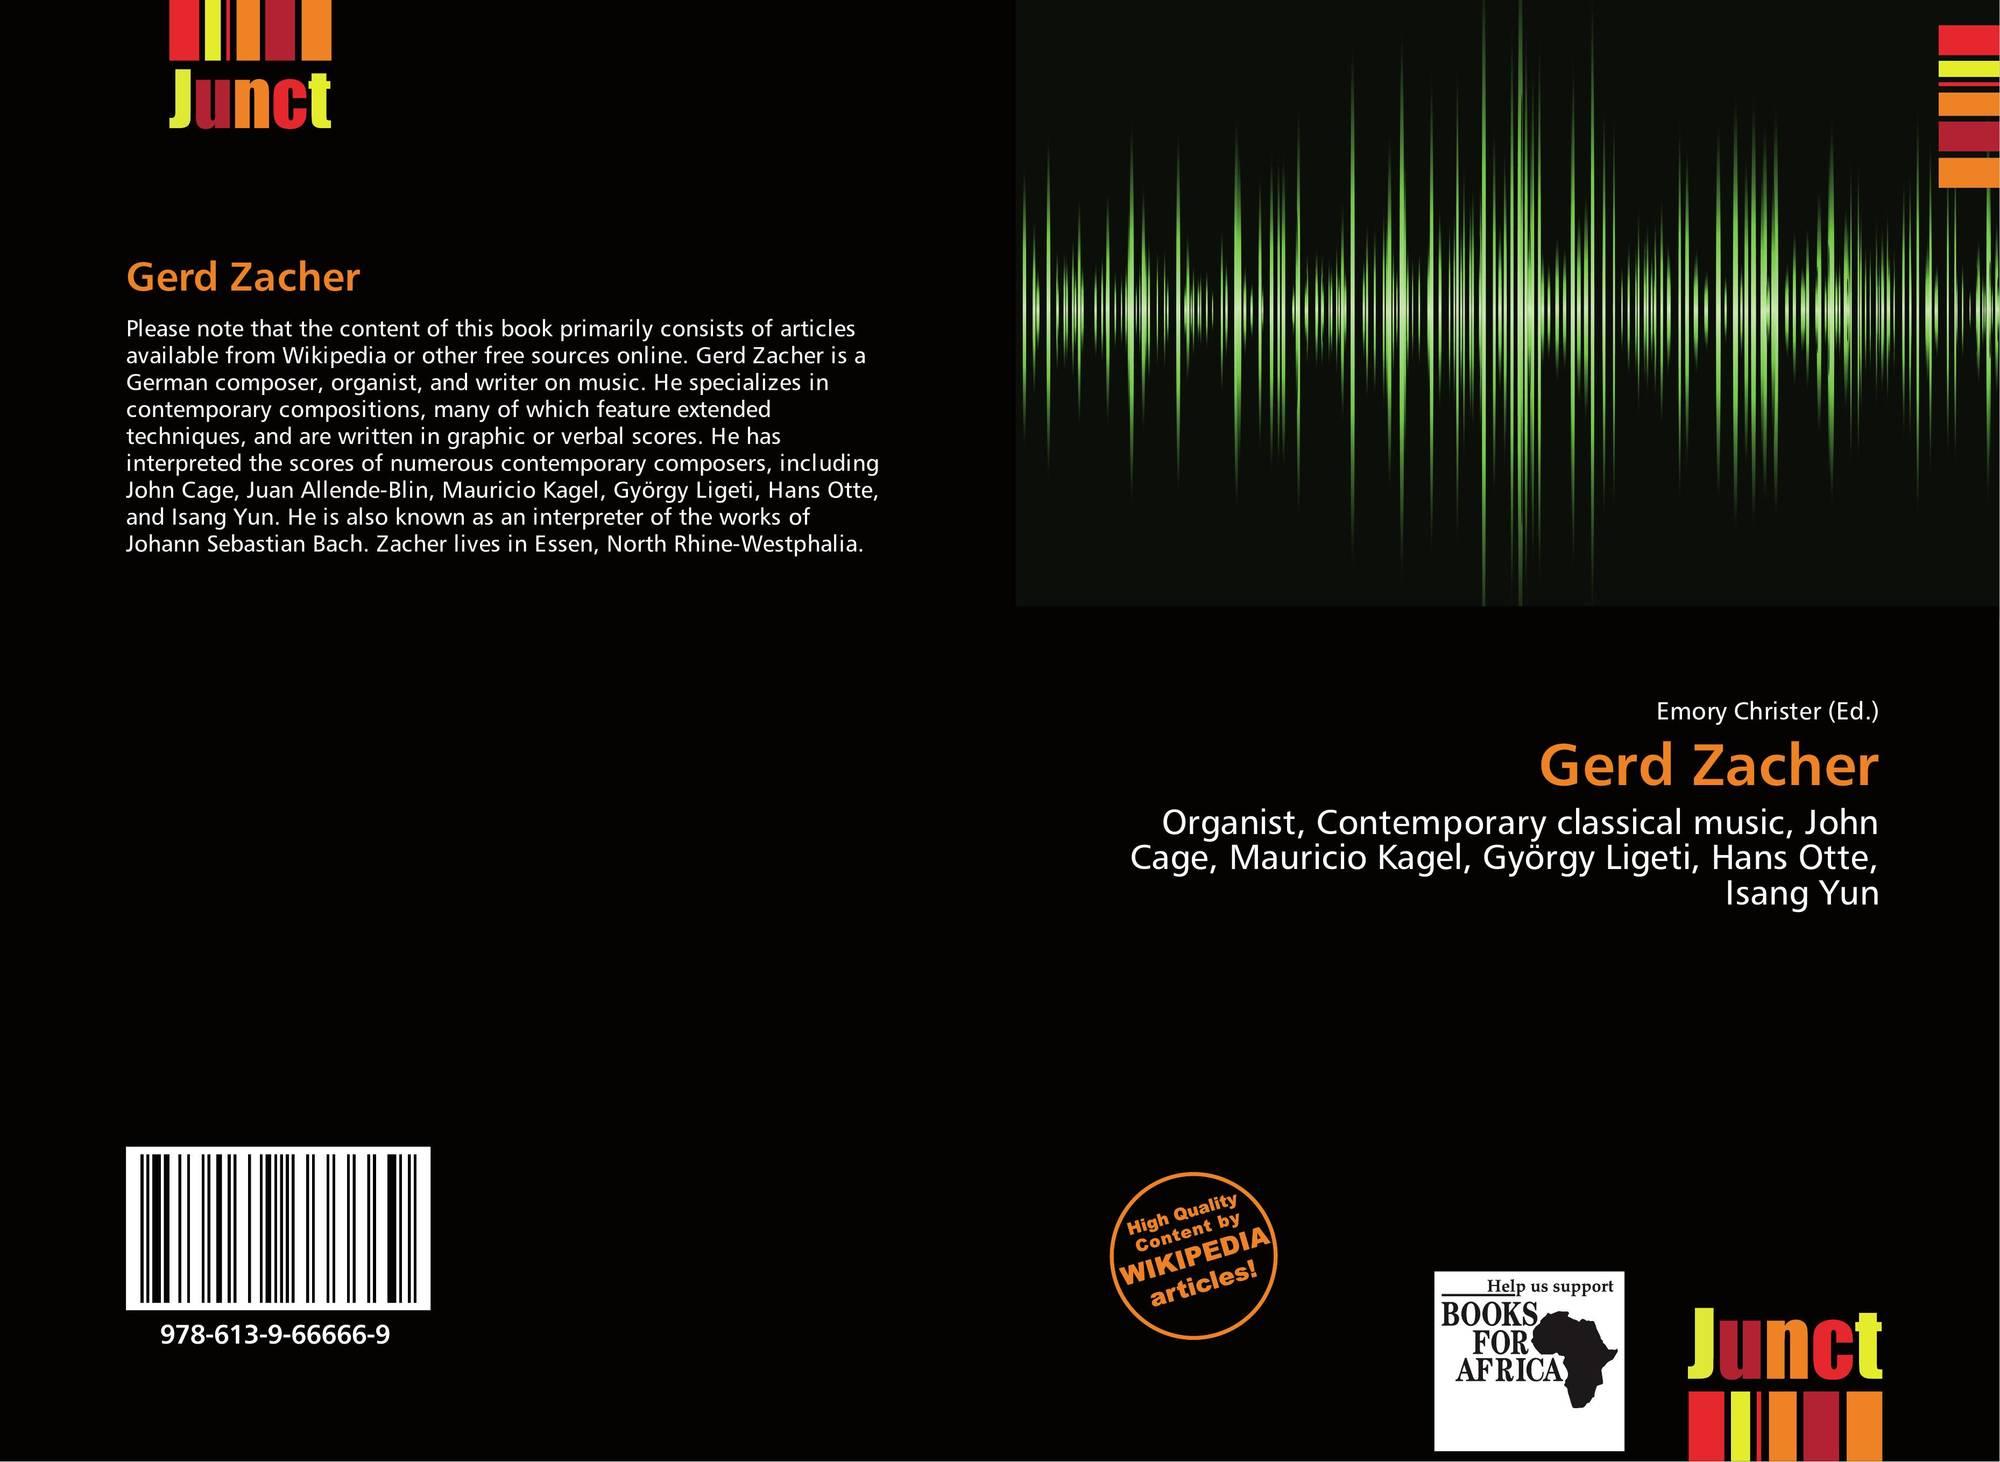 Mauricio Kagel / György Ligeti / Aldo Clementi - Transición II / Studio N. 1 / Intavolatura